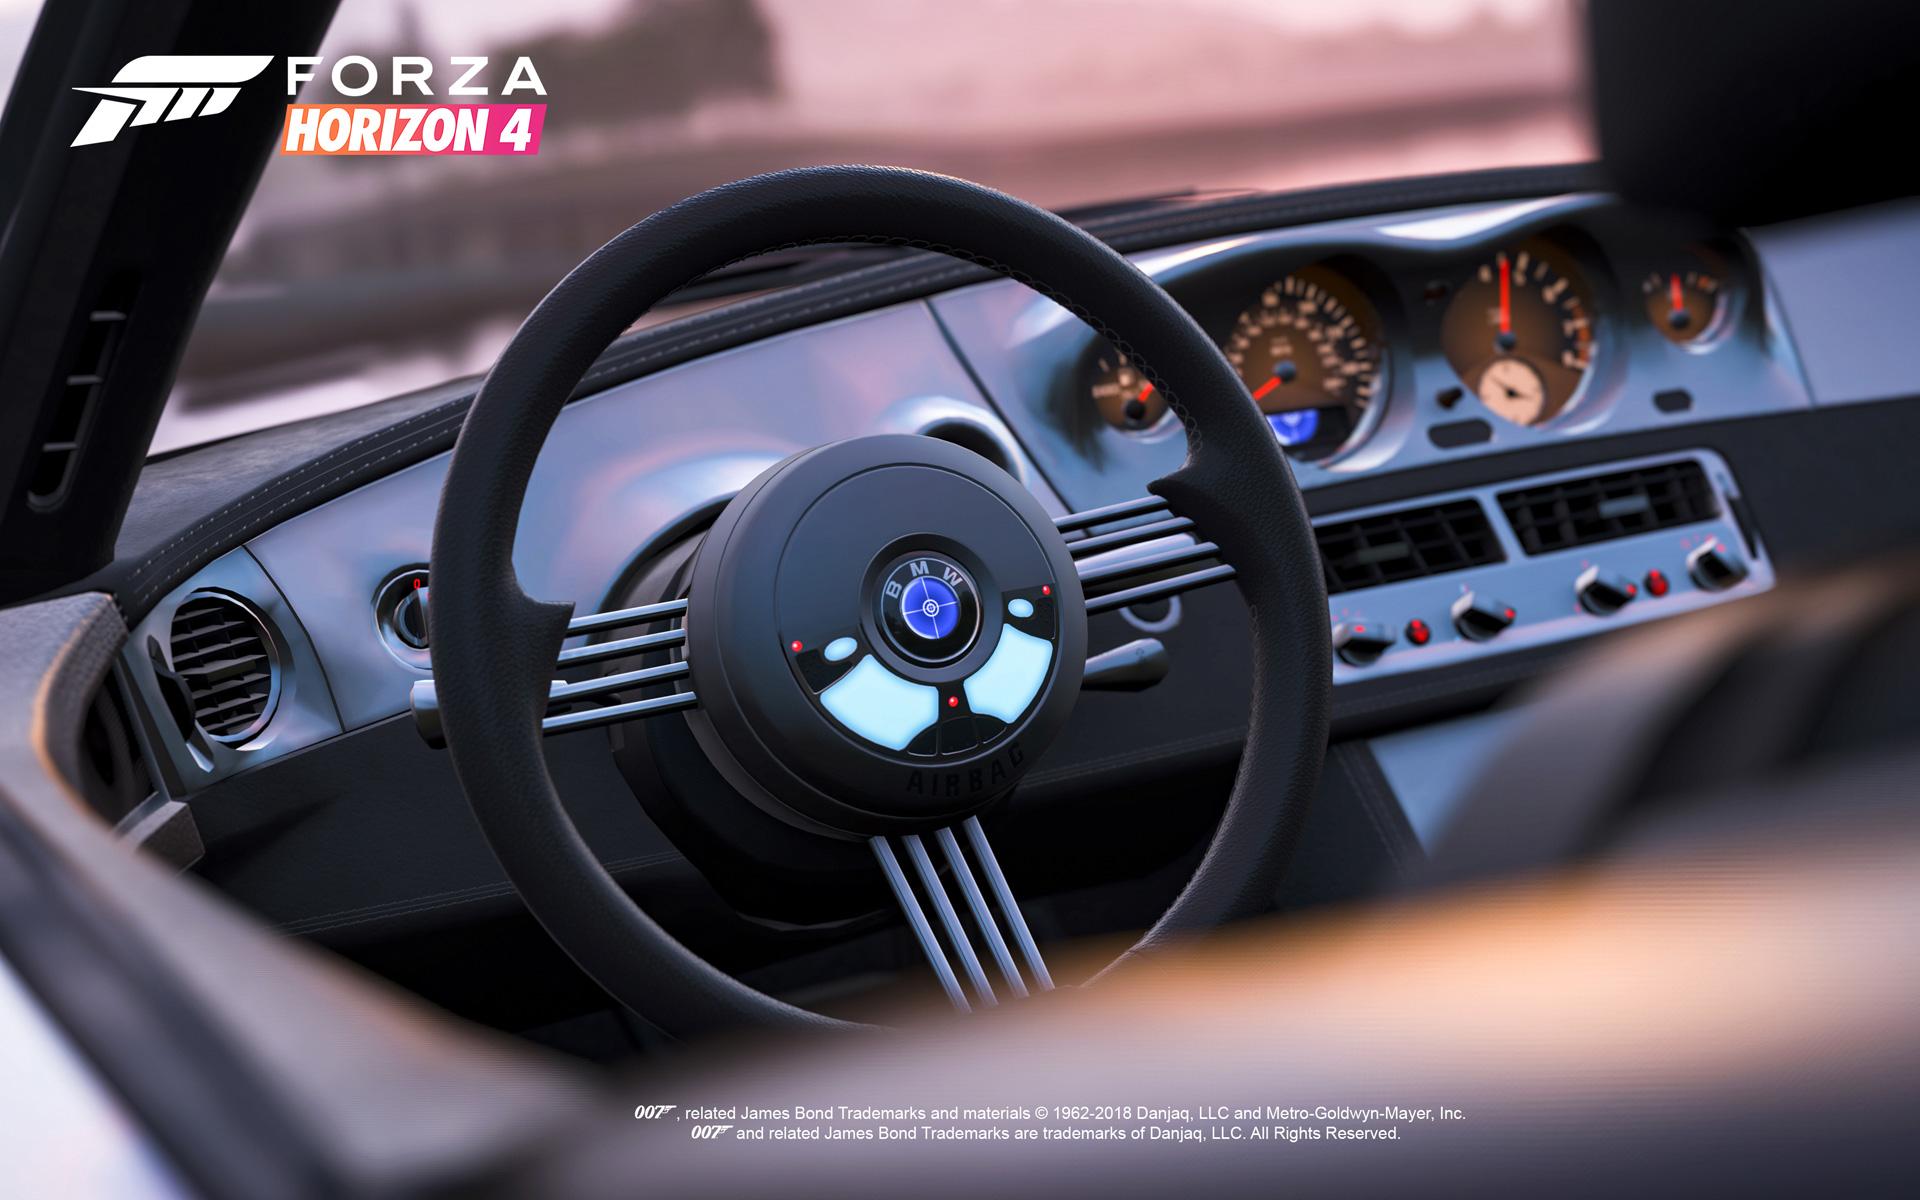 Forza Horizon 4 Wallpaper in 1920x1200